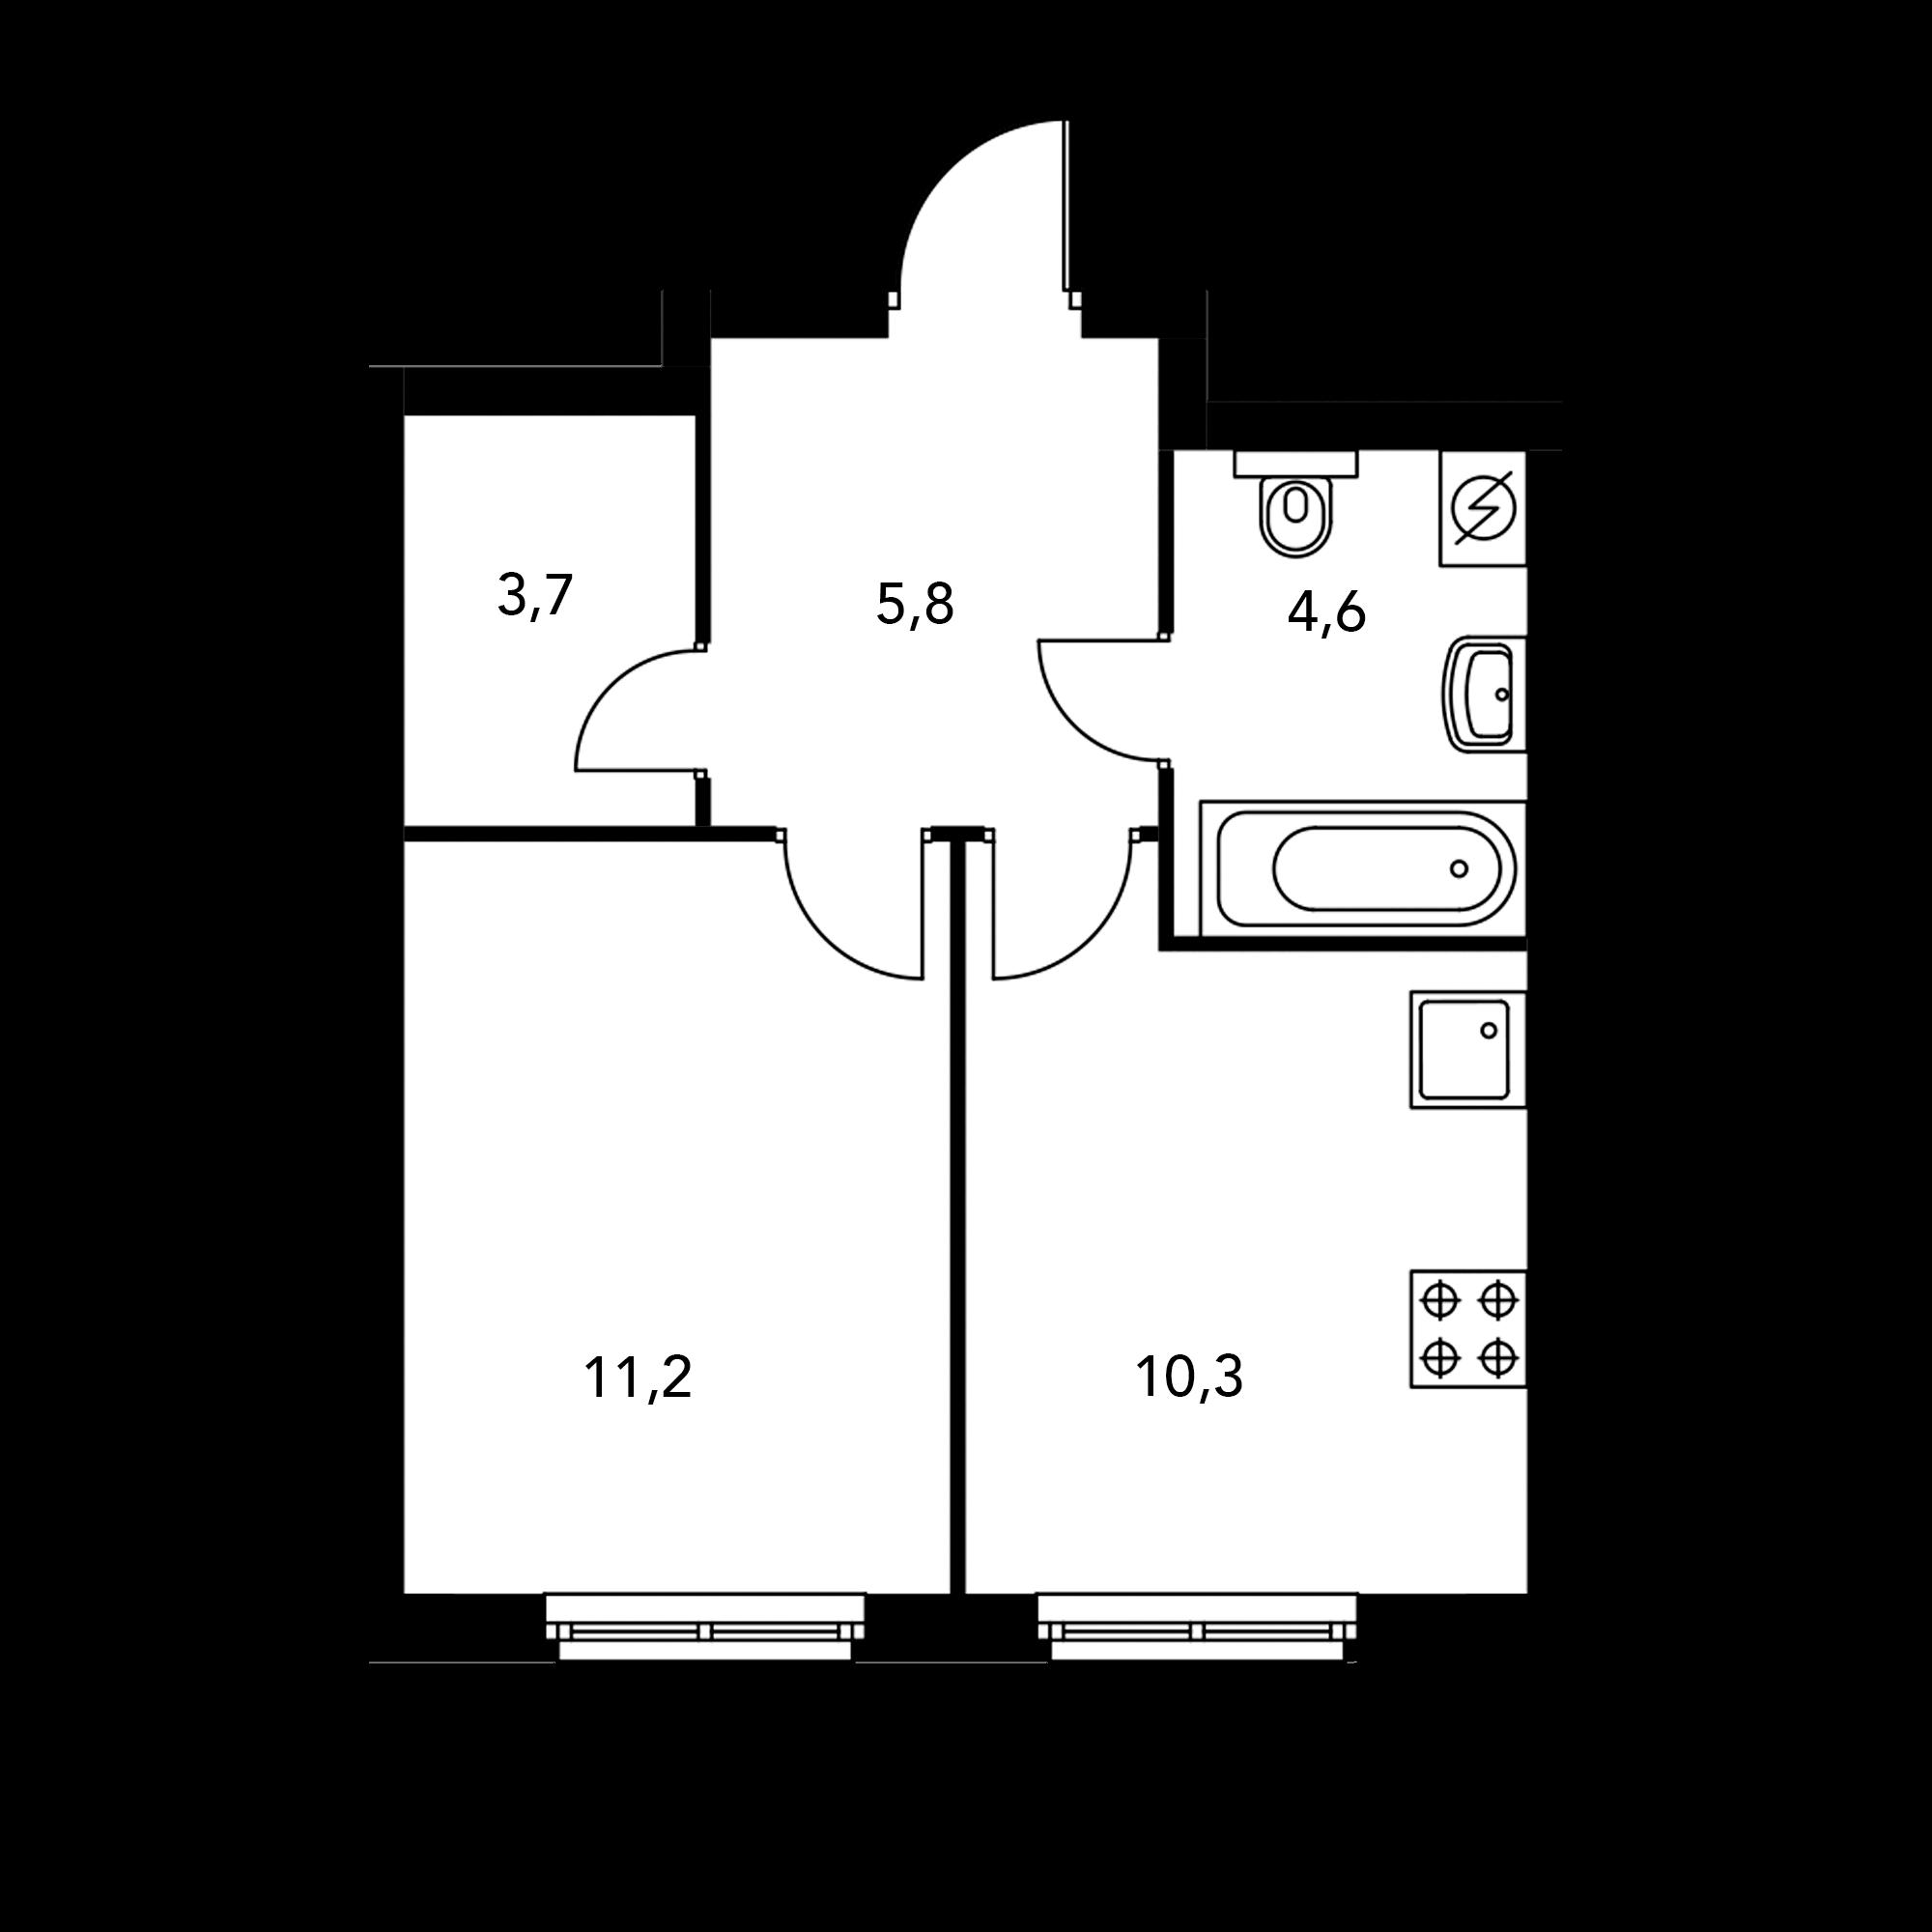 1KM1_6.0-2